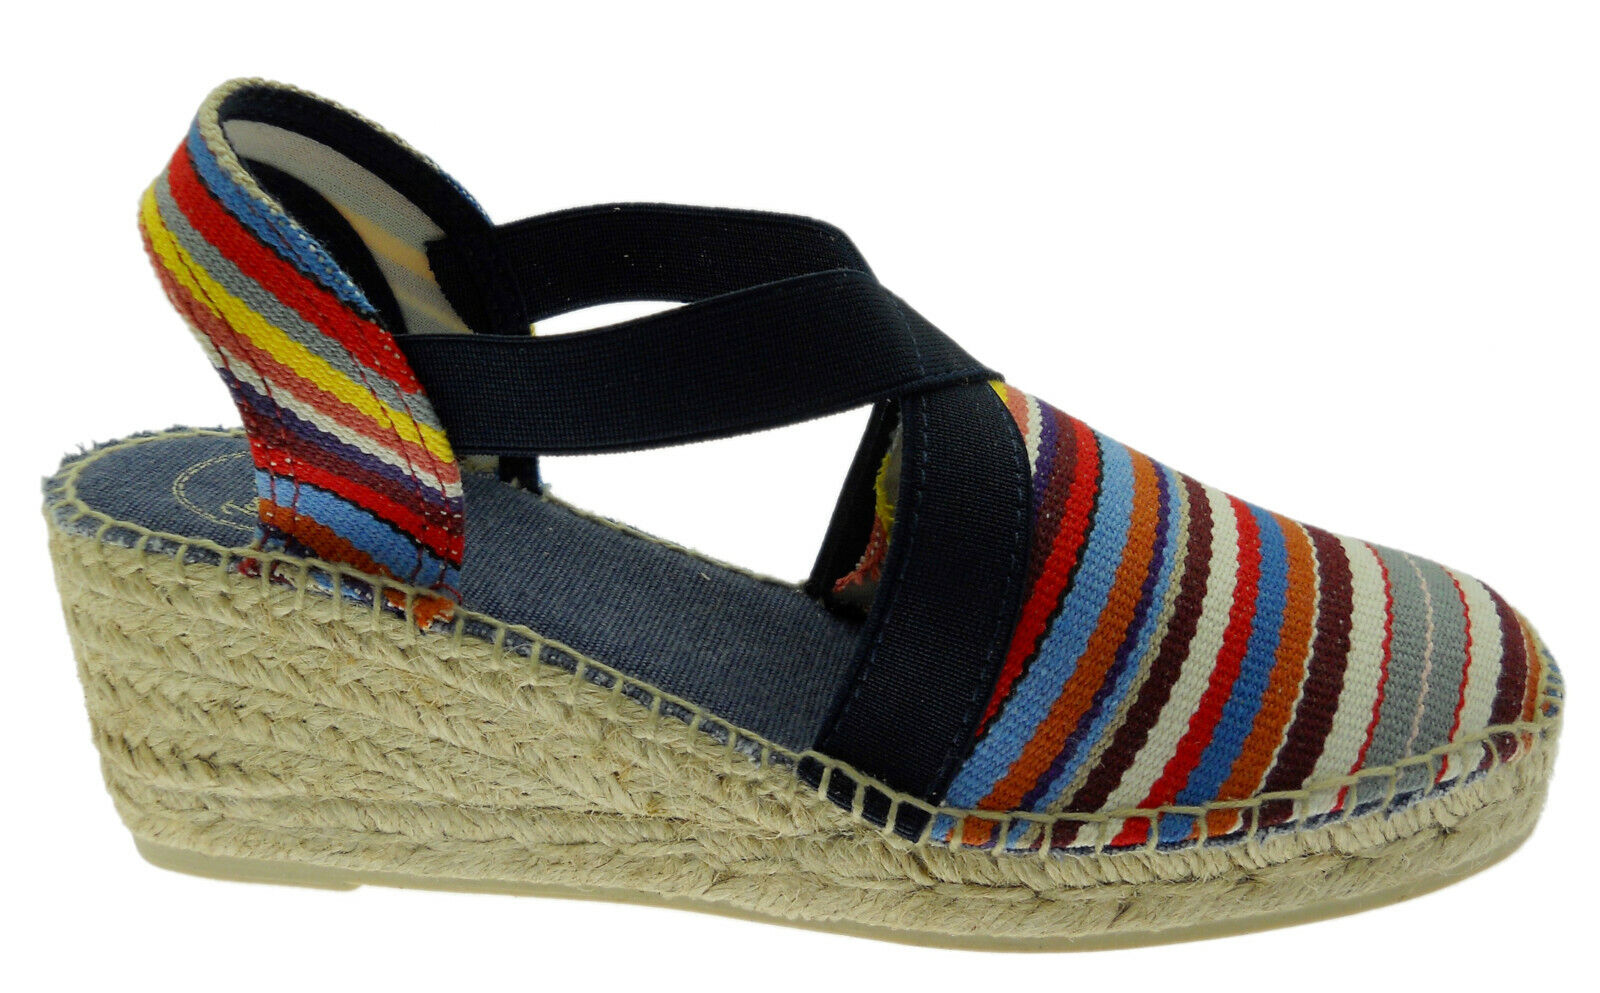 Toni PonsTARBES multicolord striped espadrilles Toni Pons